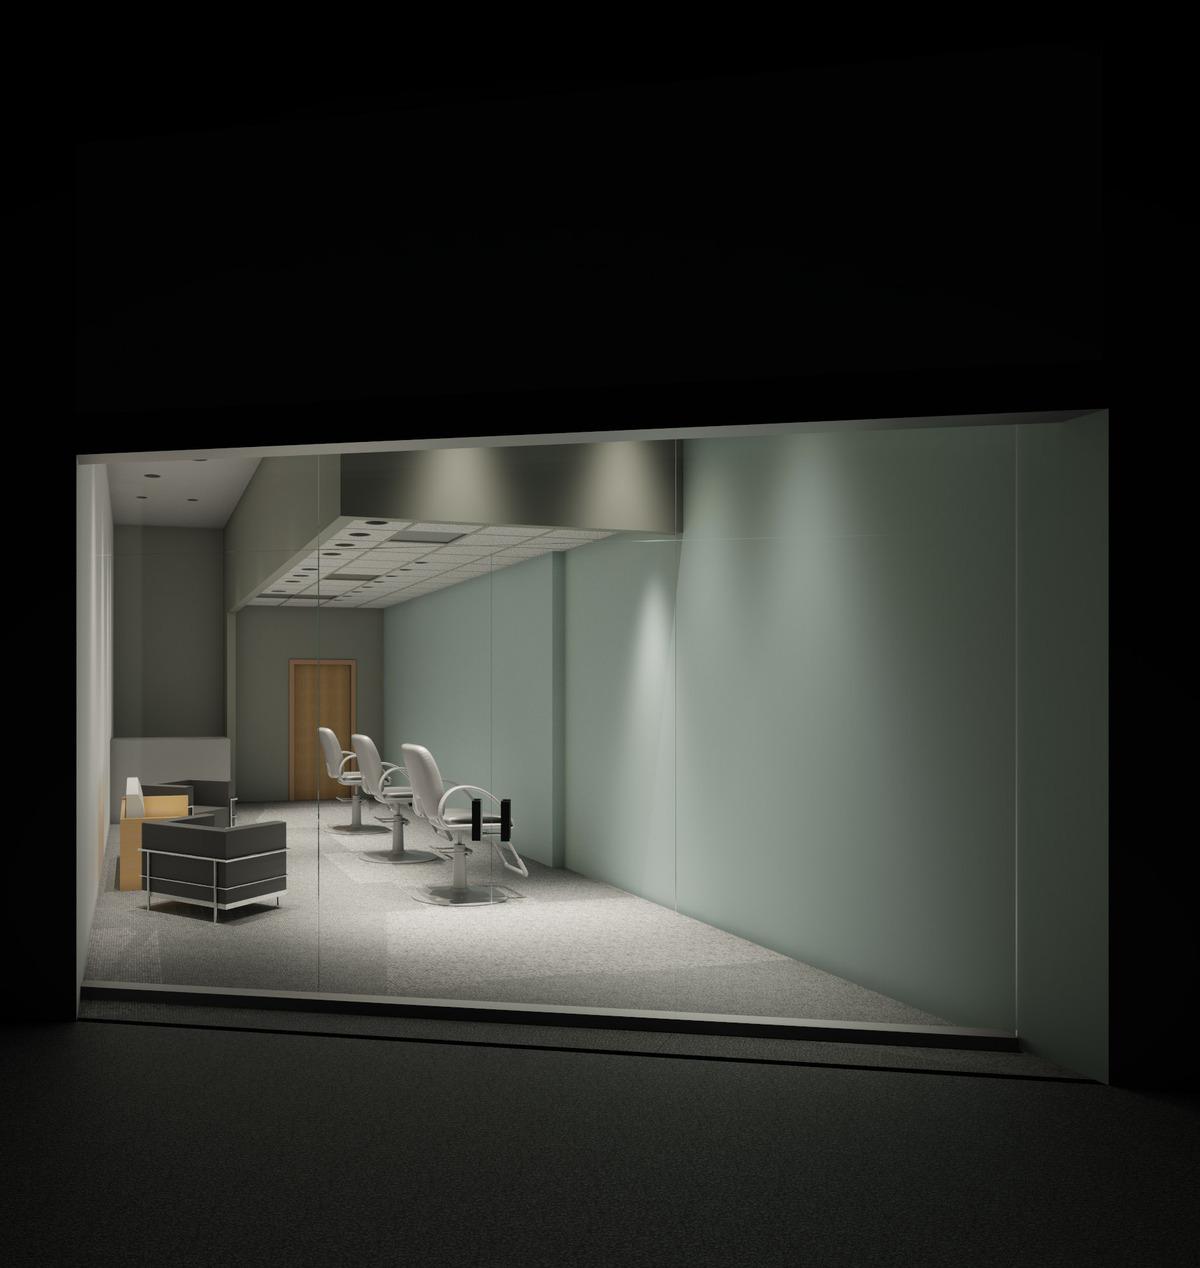 Interior lighting only